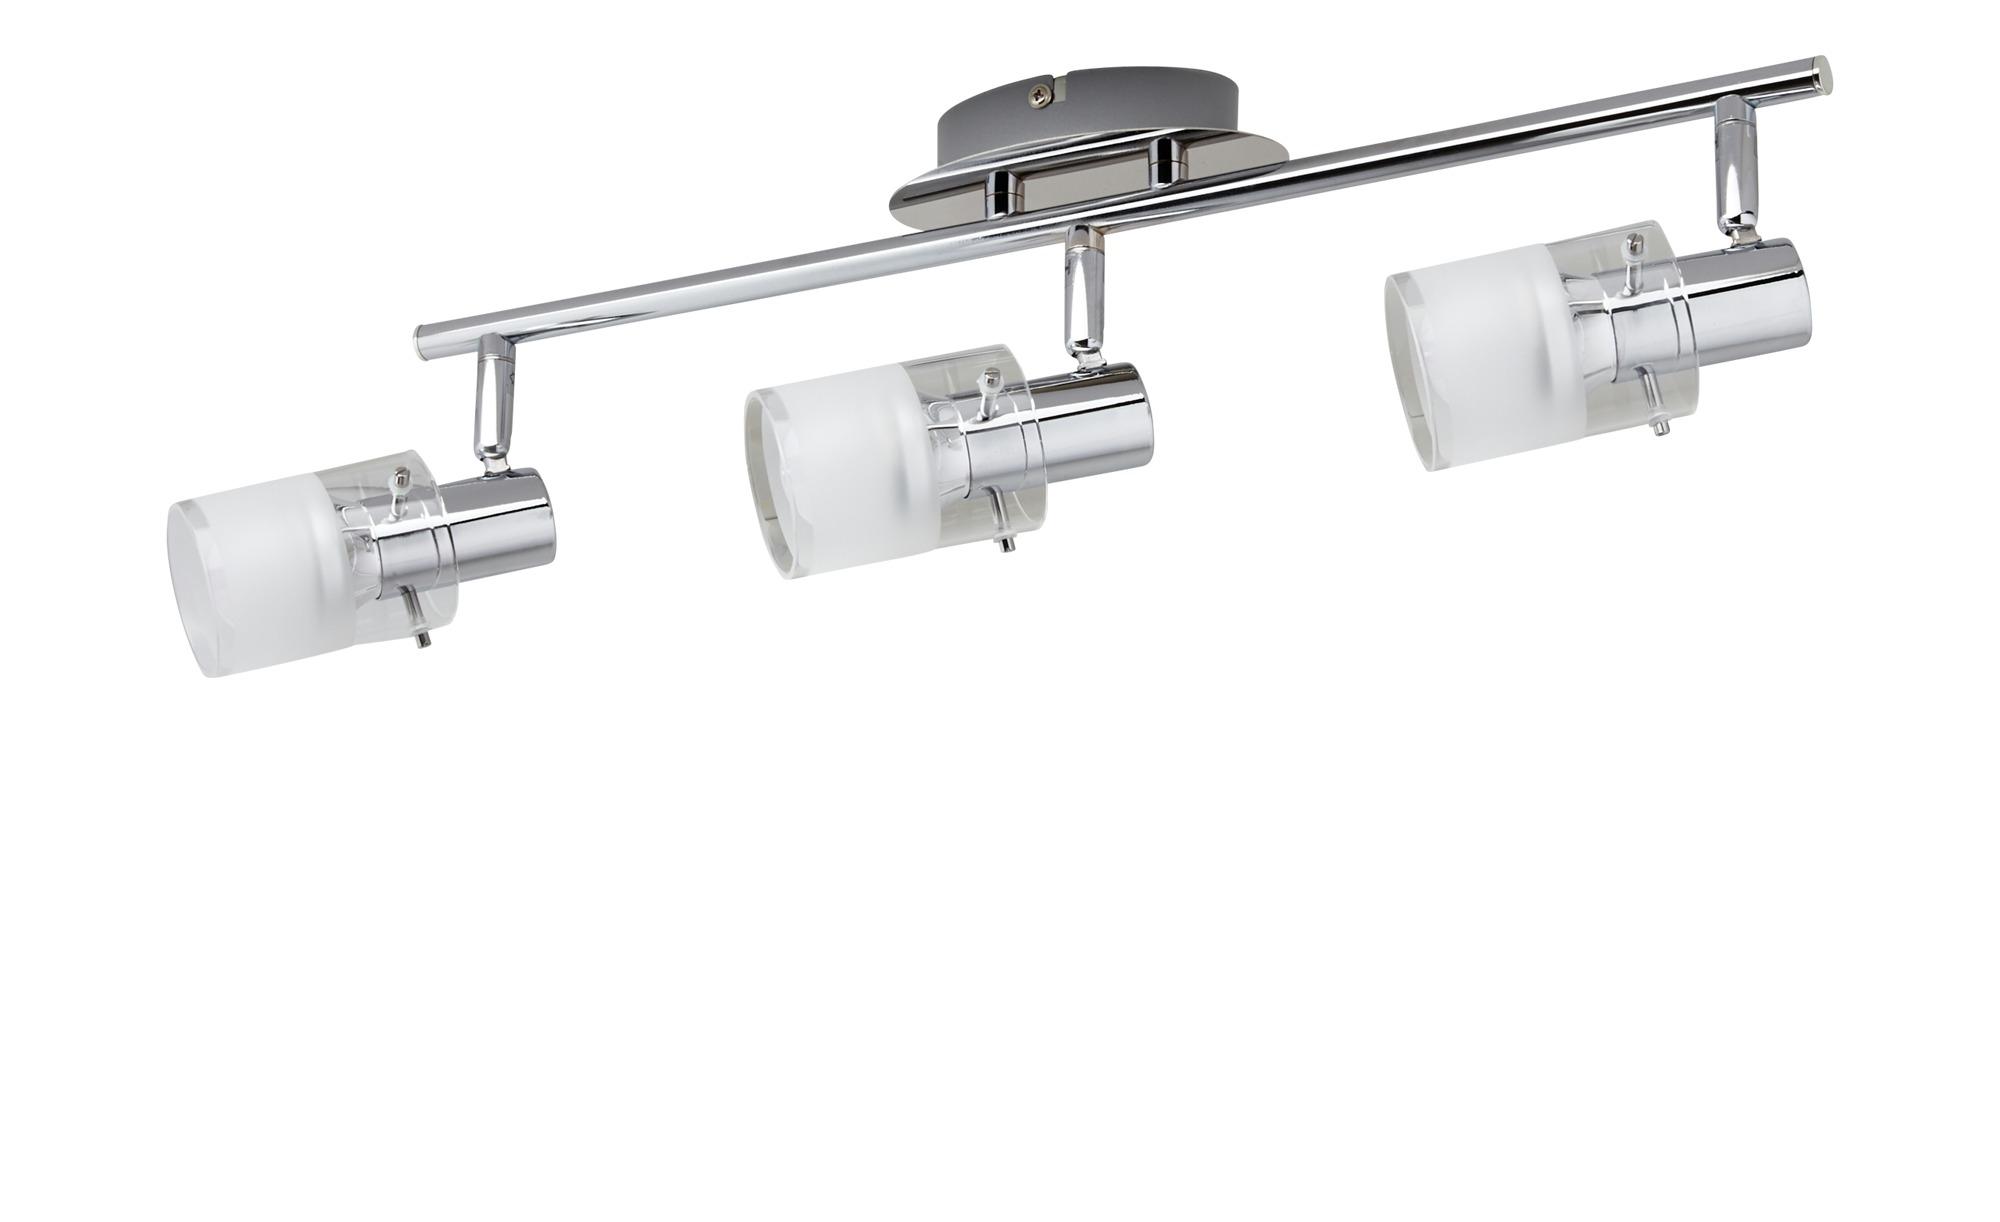 KHG LED- Deckenstrahler, 3-flammig mit Glas ¦ silber ¦ Maße (cm): B: 8 H: 12 Lampen & Leuchten > LED-Leuchten > LED-Strahler & Spots - Höffner